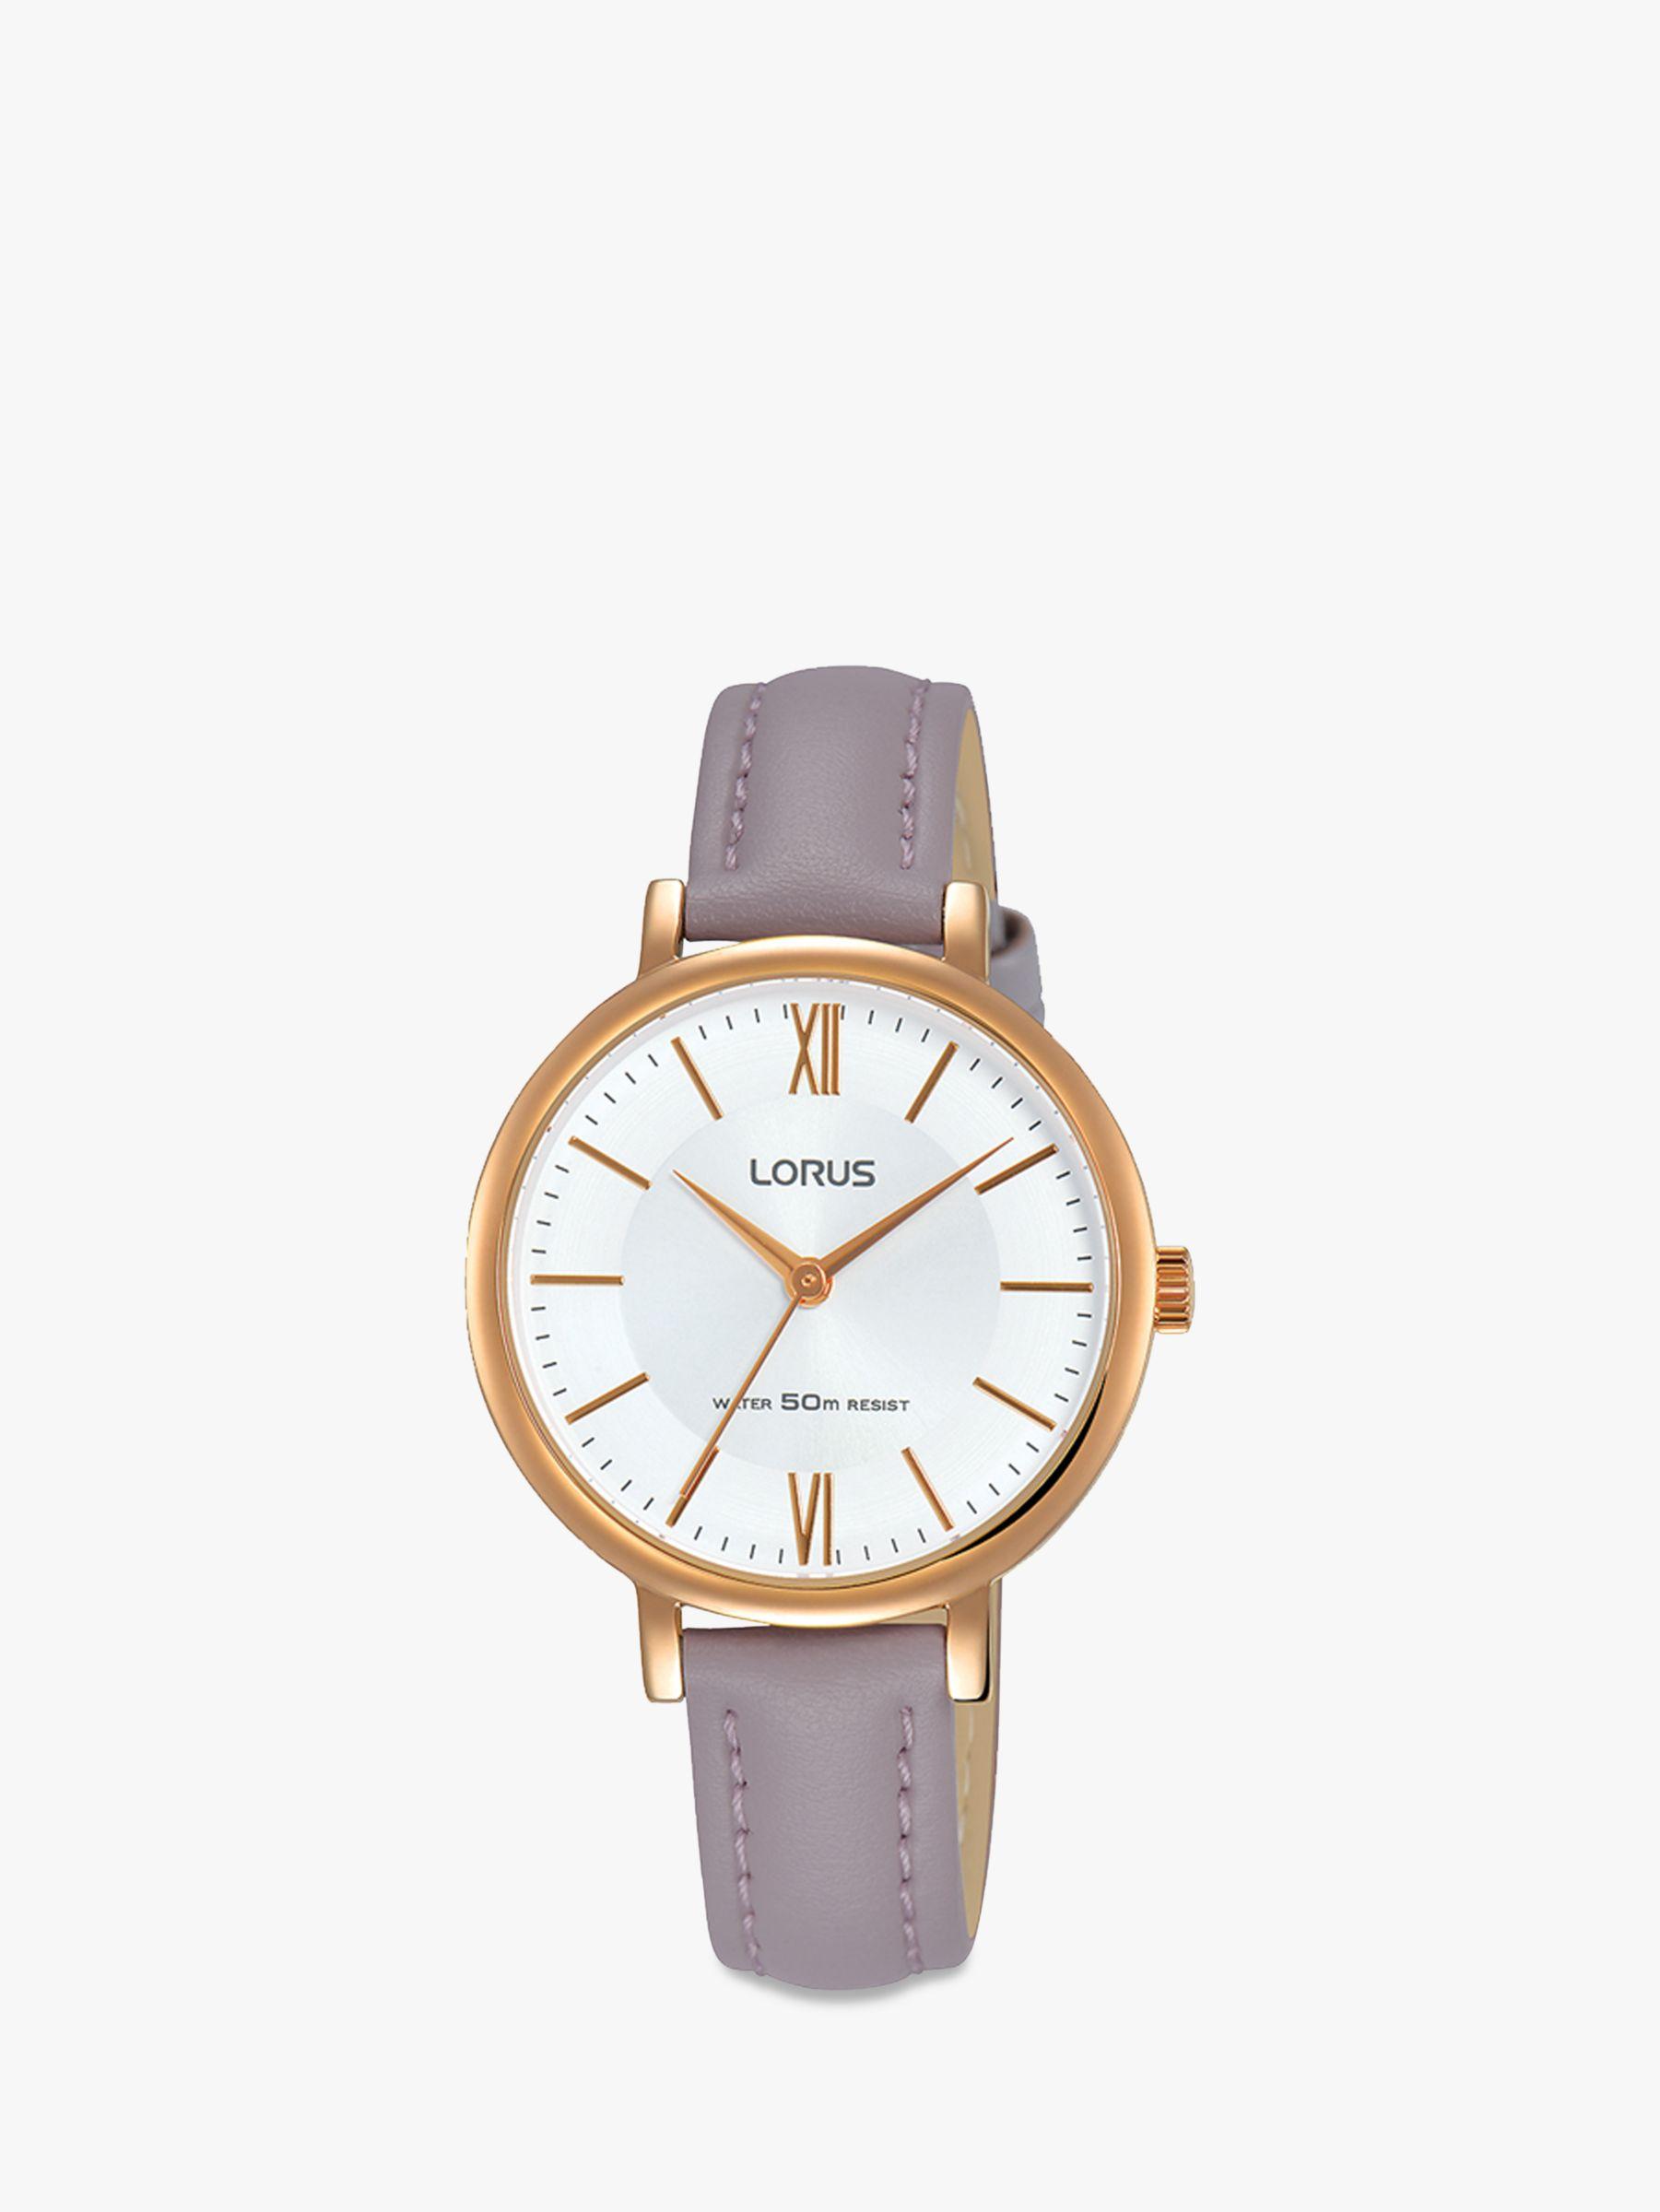 Lorus Lorus Women's Leather Strap Watch, Purple/White RG264LX6